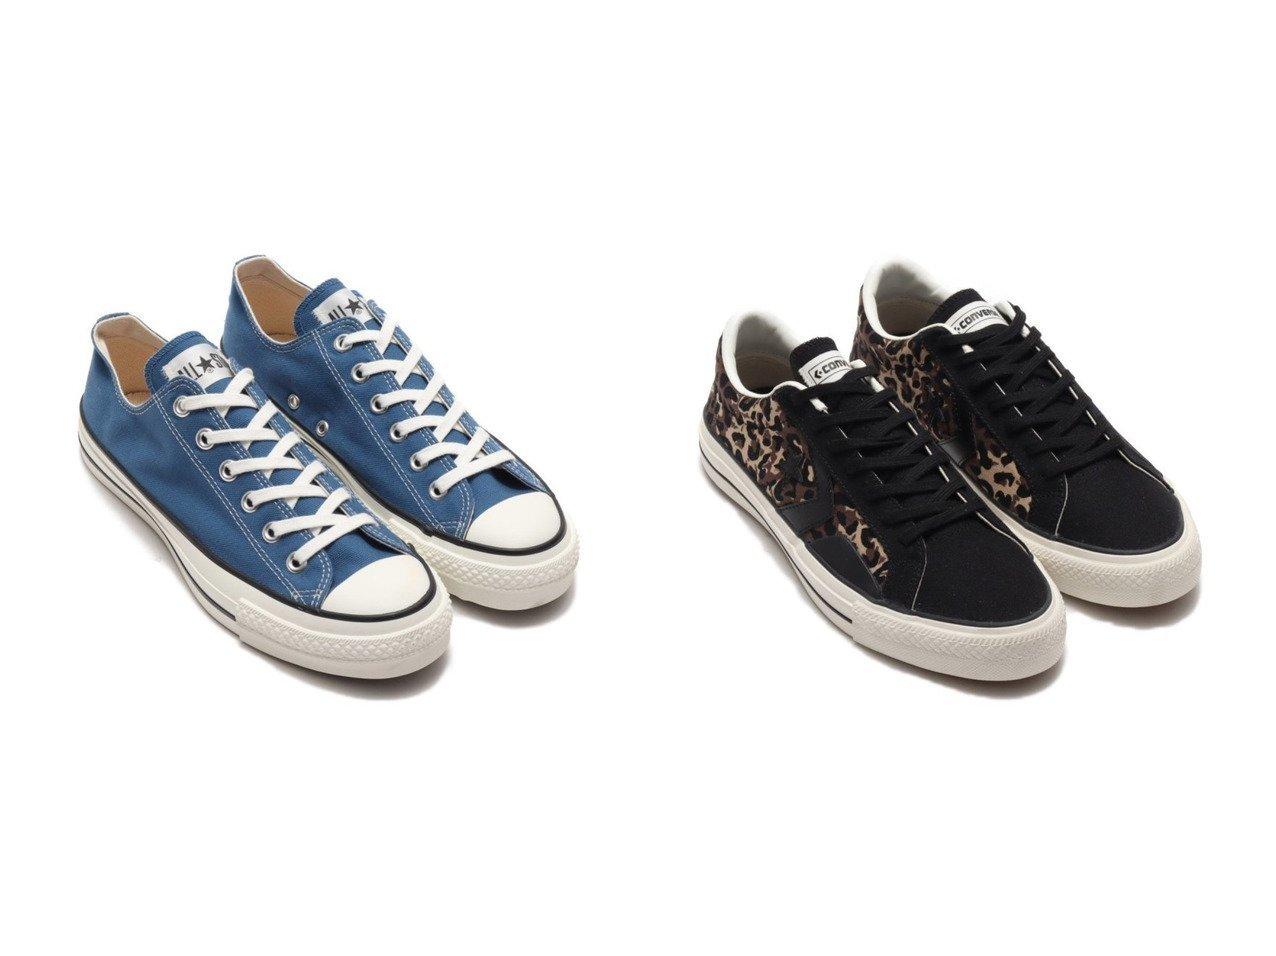 【CONVERSE/コンバース】のCONVERSE PRORIDE SK PT OX&CONVERSE CANVAS ALL STAR J OX 【シューズ・靴】おすすめ!人気、トレンド・レディースファッションの通販 おすすめで人気の流行・トレンド、ファッションの通販商品 メンズファッション・キッズファッション・インテリア・家具・レディースファッション・服の通販 founy(ファニー) https://founy.com/ ファッション Fashion レディースファッション WOMEN NEW・新作・新着・新入荷 New Arrivals キャンバス クール コンビ シューズ スタンダード スニーカー スリッポン 人気 S/S・春夏 SS・Spring/Summer 日本製 Made in Japan 春 Spring |ID:crp329100000027853